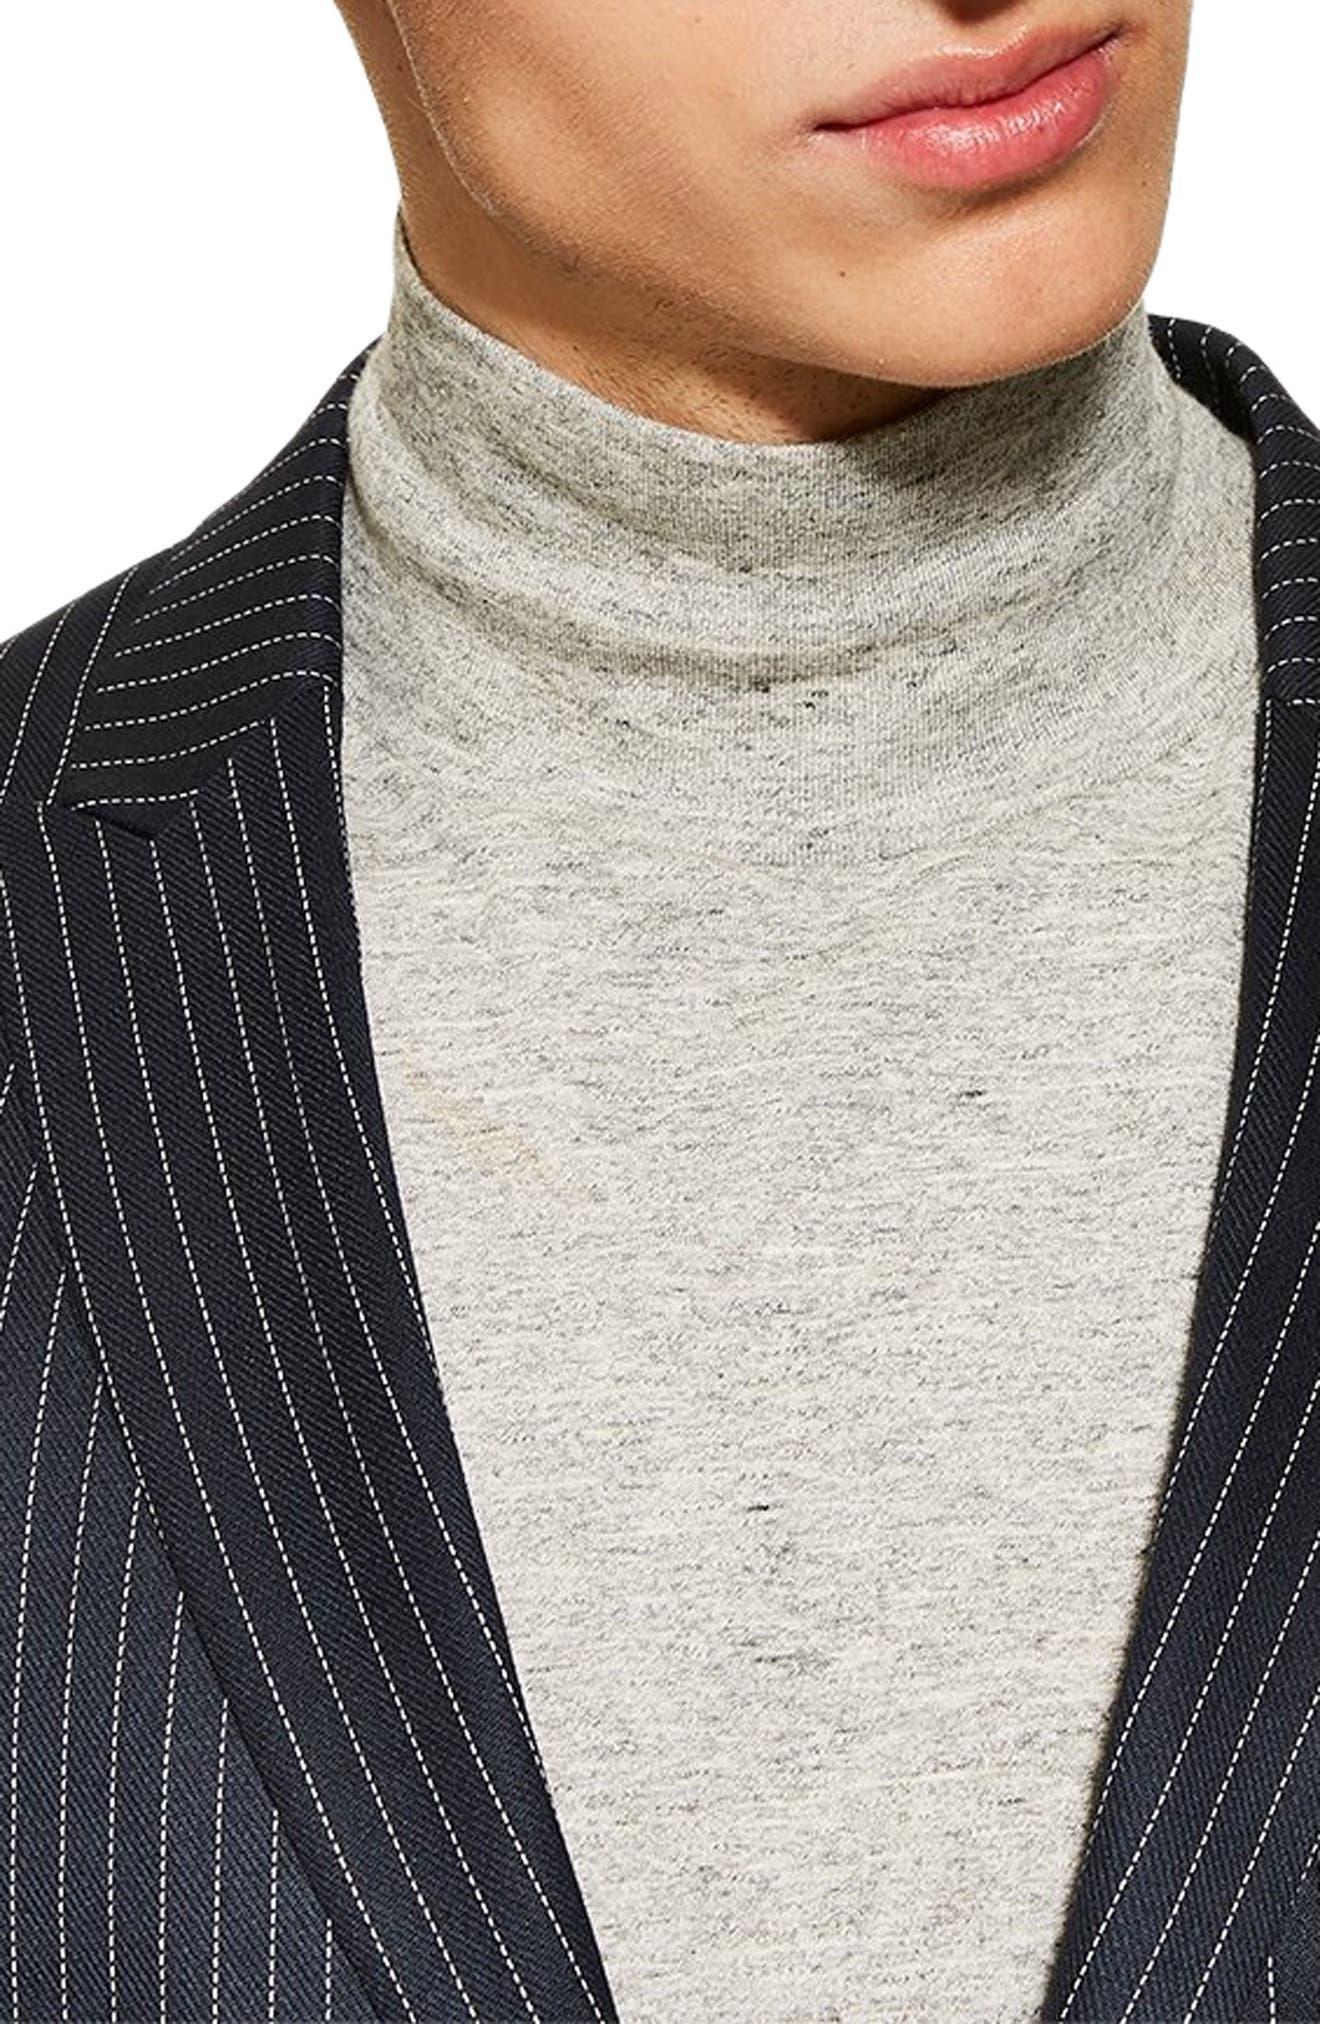 Tailored Pinstripe Suit Jacket,                             Alternate thumbnail 3, color,                             NAVY BLUE